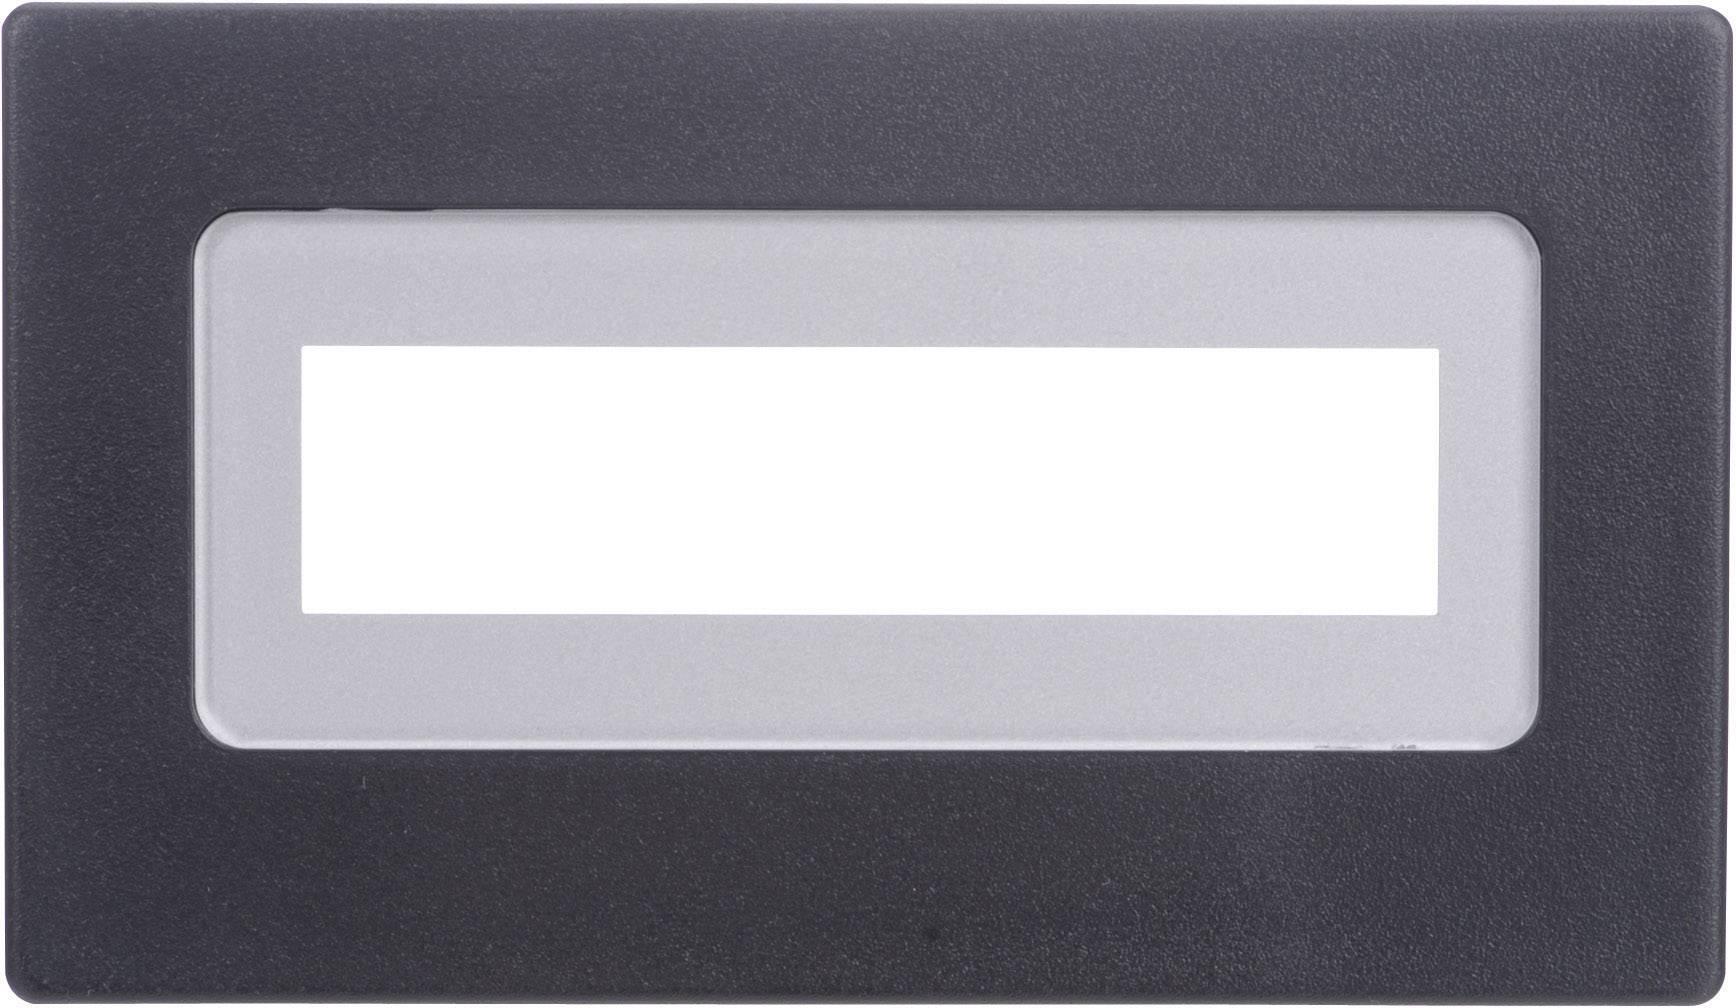 Rámeček pro alfanumerické LCD displeje 2x16, 91 x 53 x 20 mm H Tronic FR 216